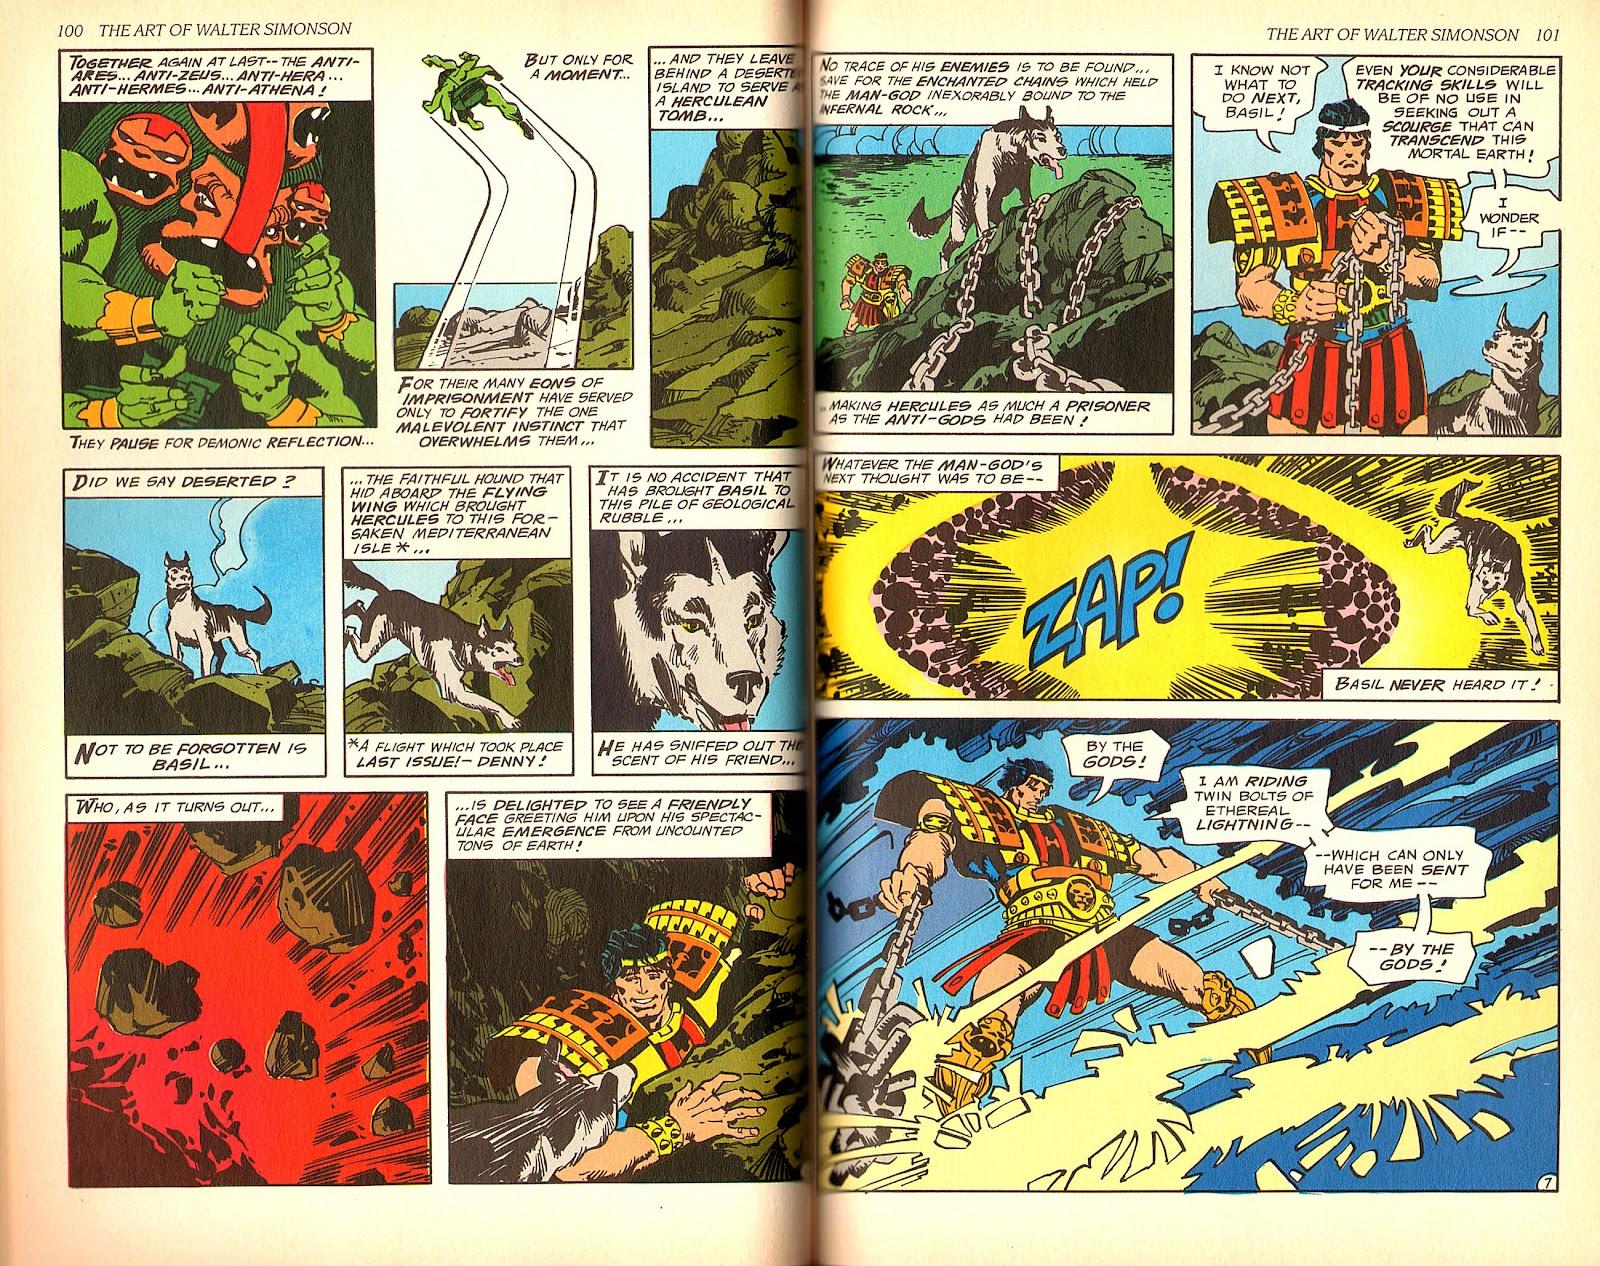 Read online The Art of Walter Simonson comic -  Issue # TPB - 52